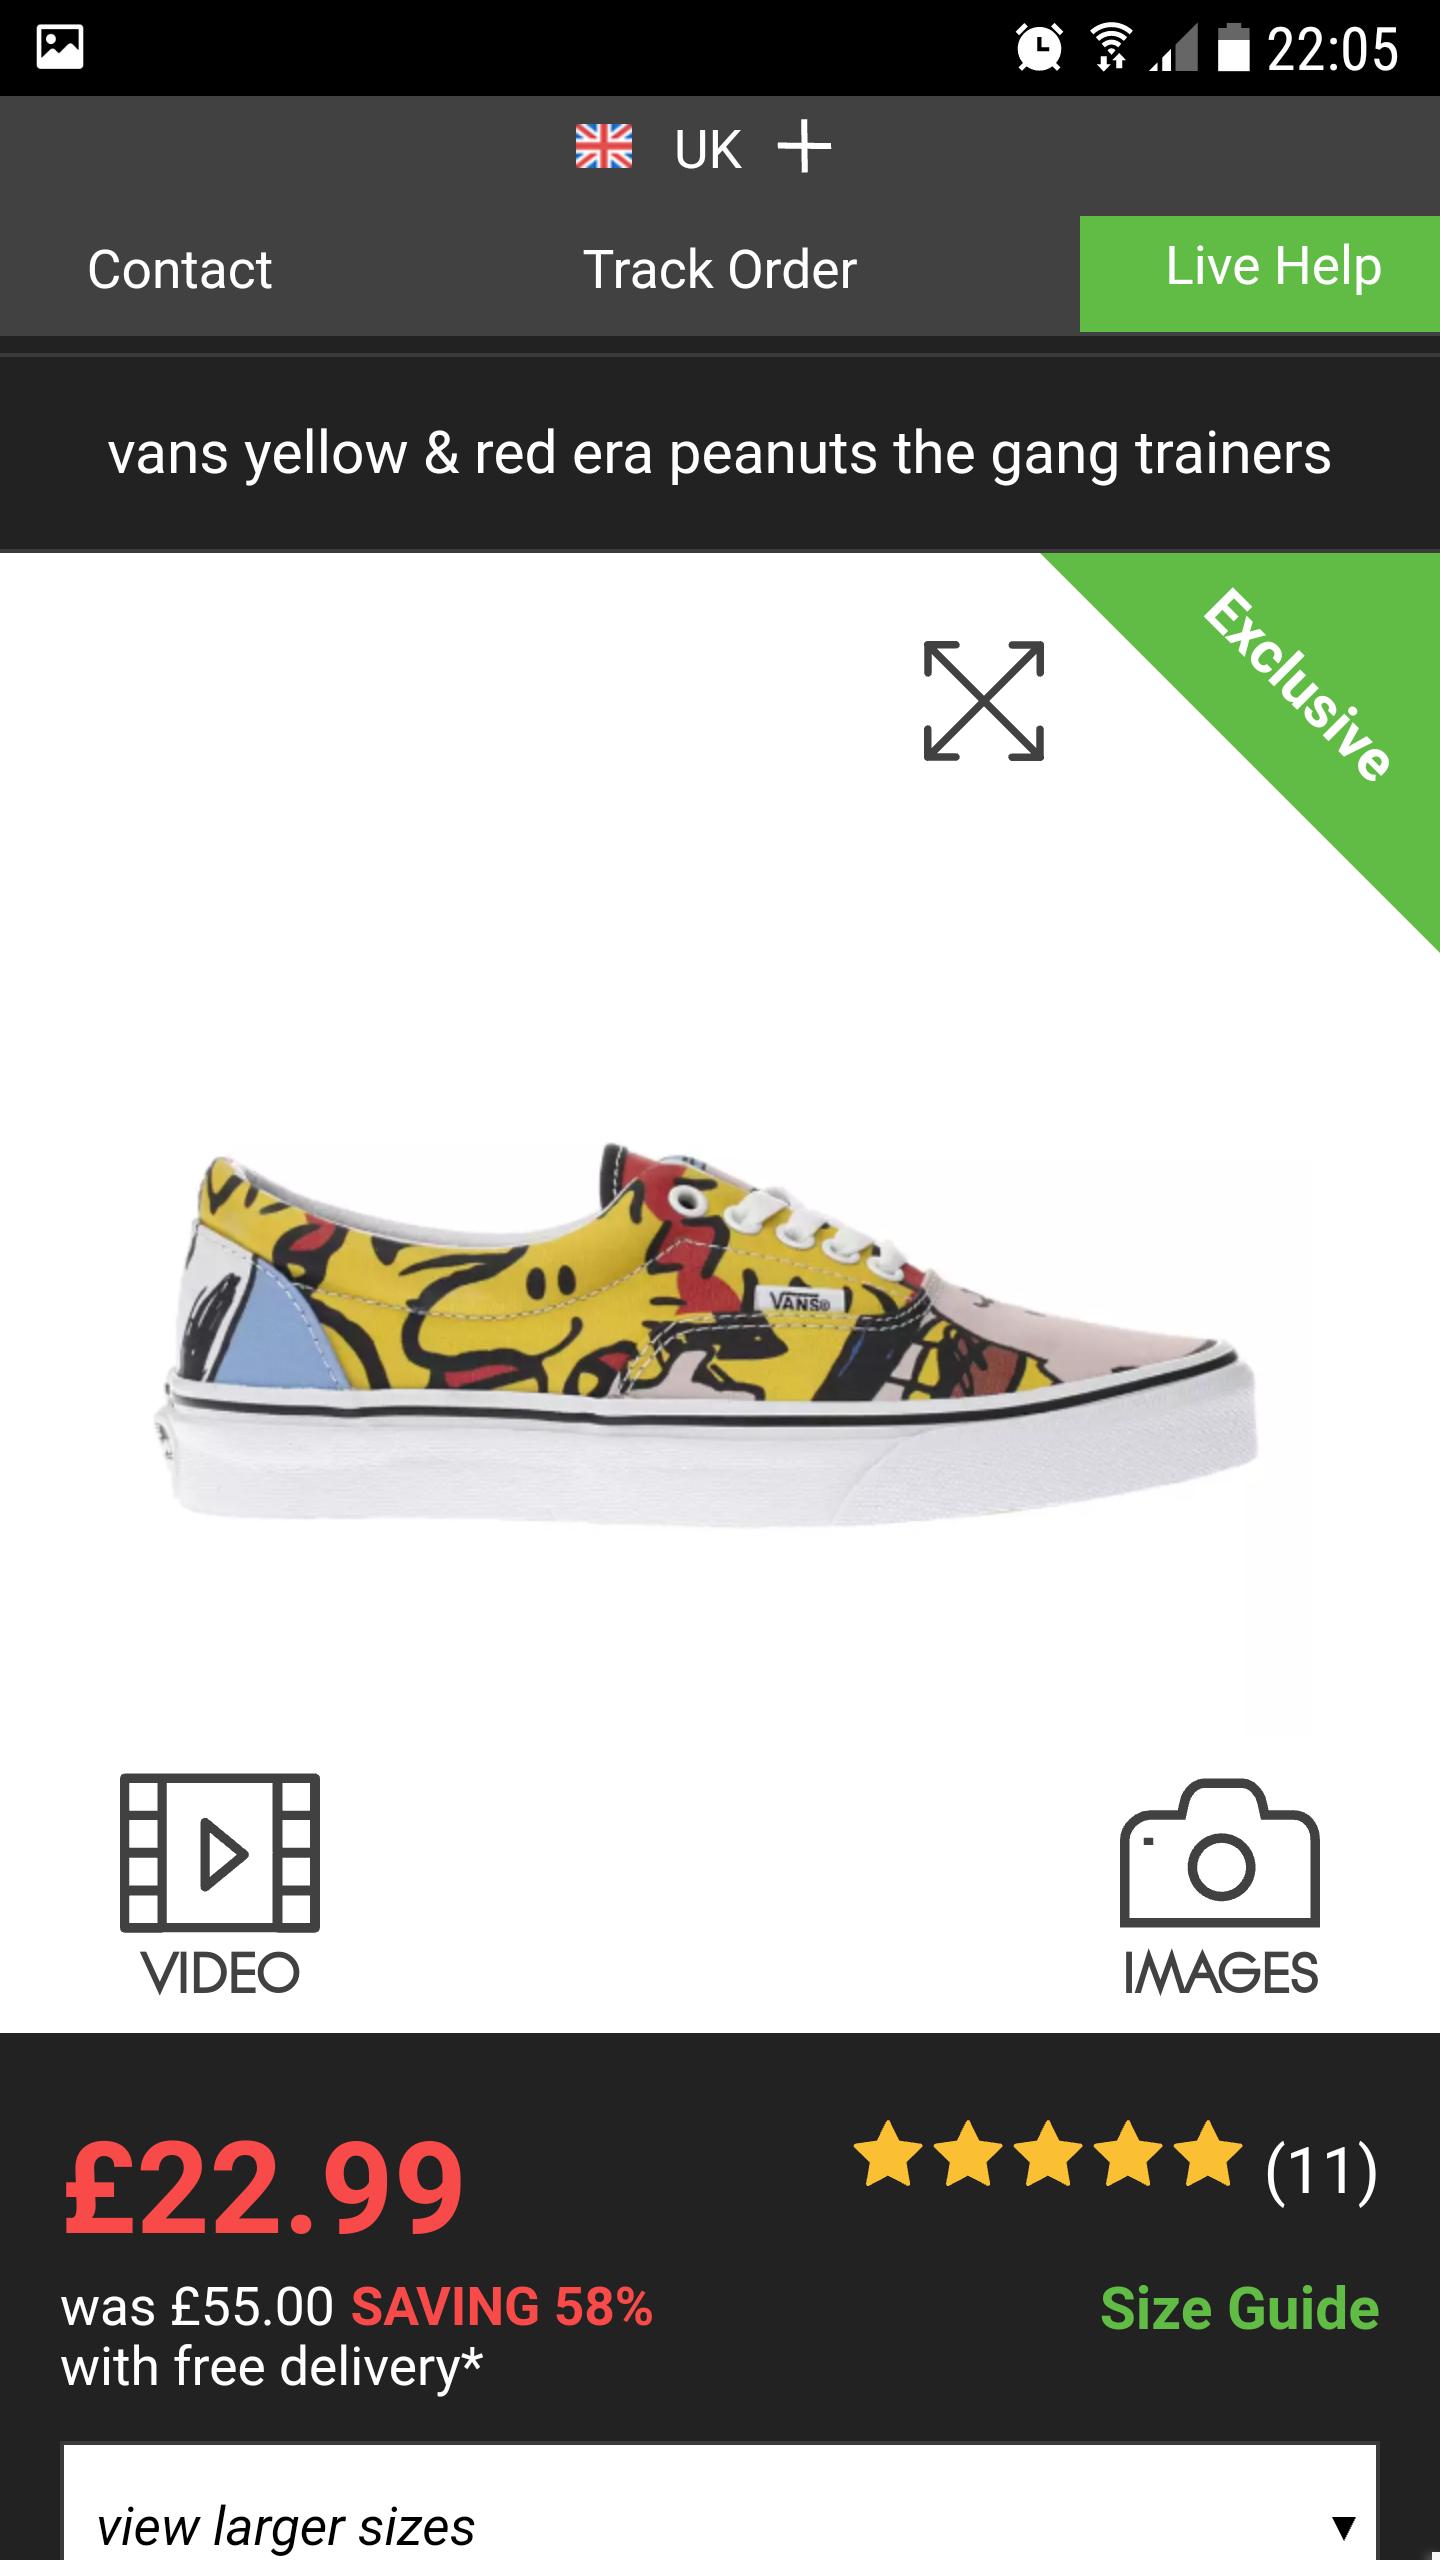 Schuh - Vans - Peanuts £22.99 from £55 C&C